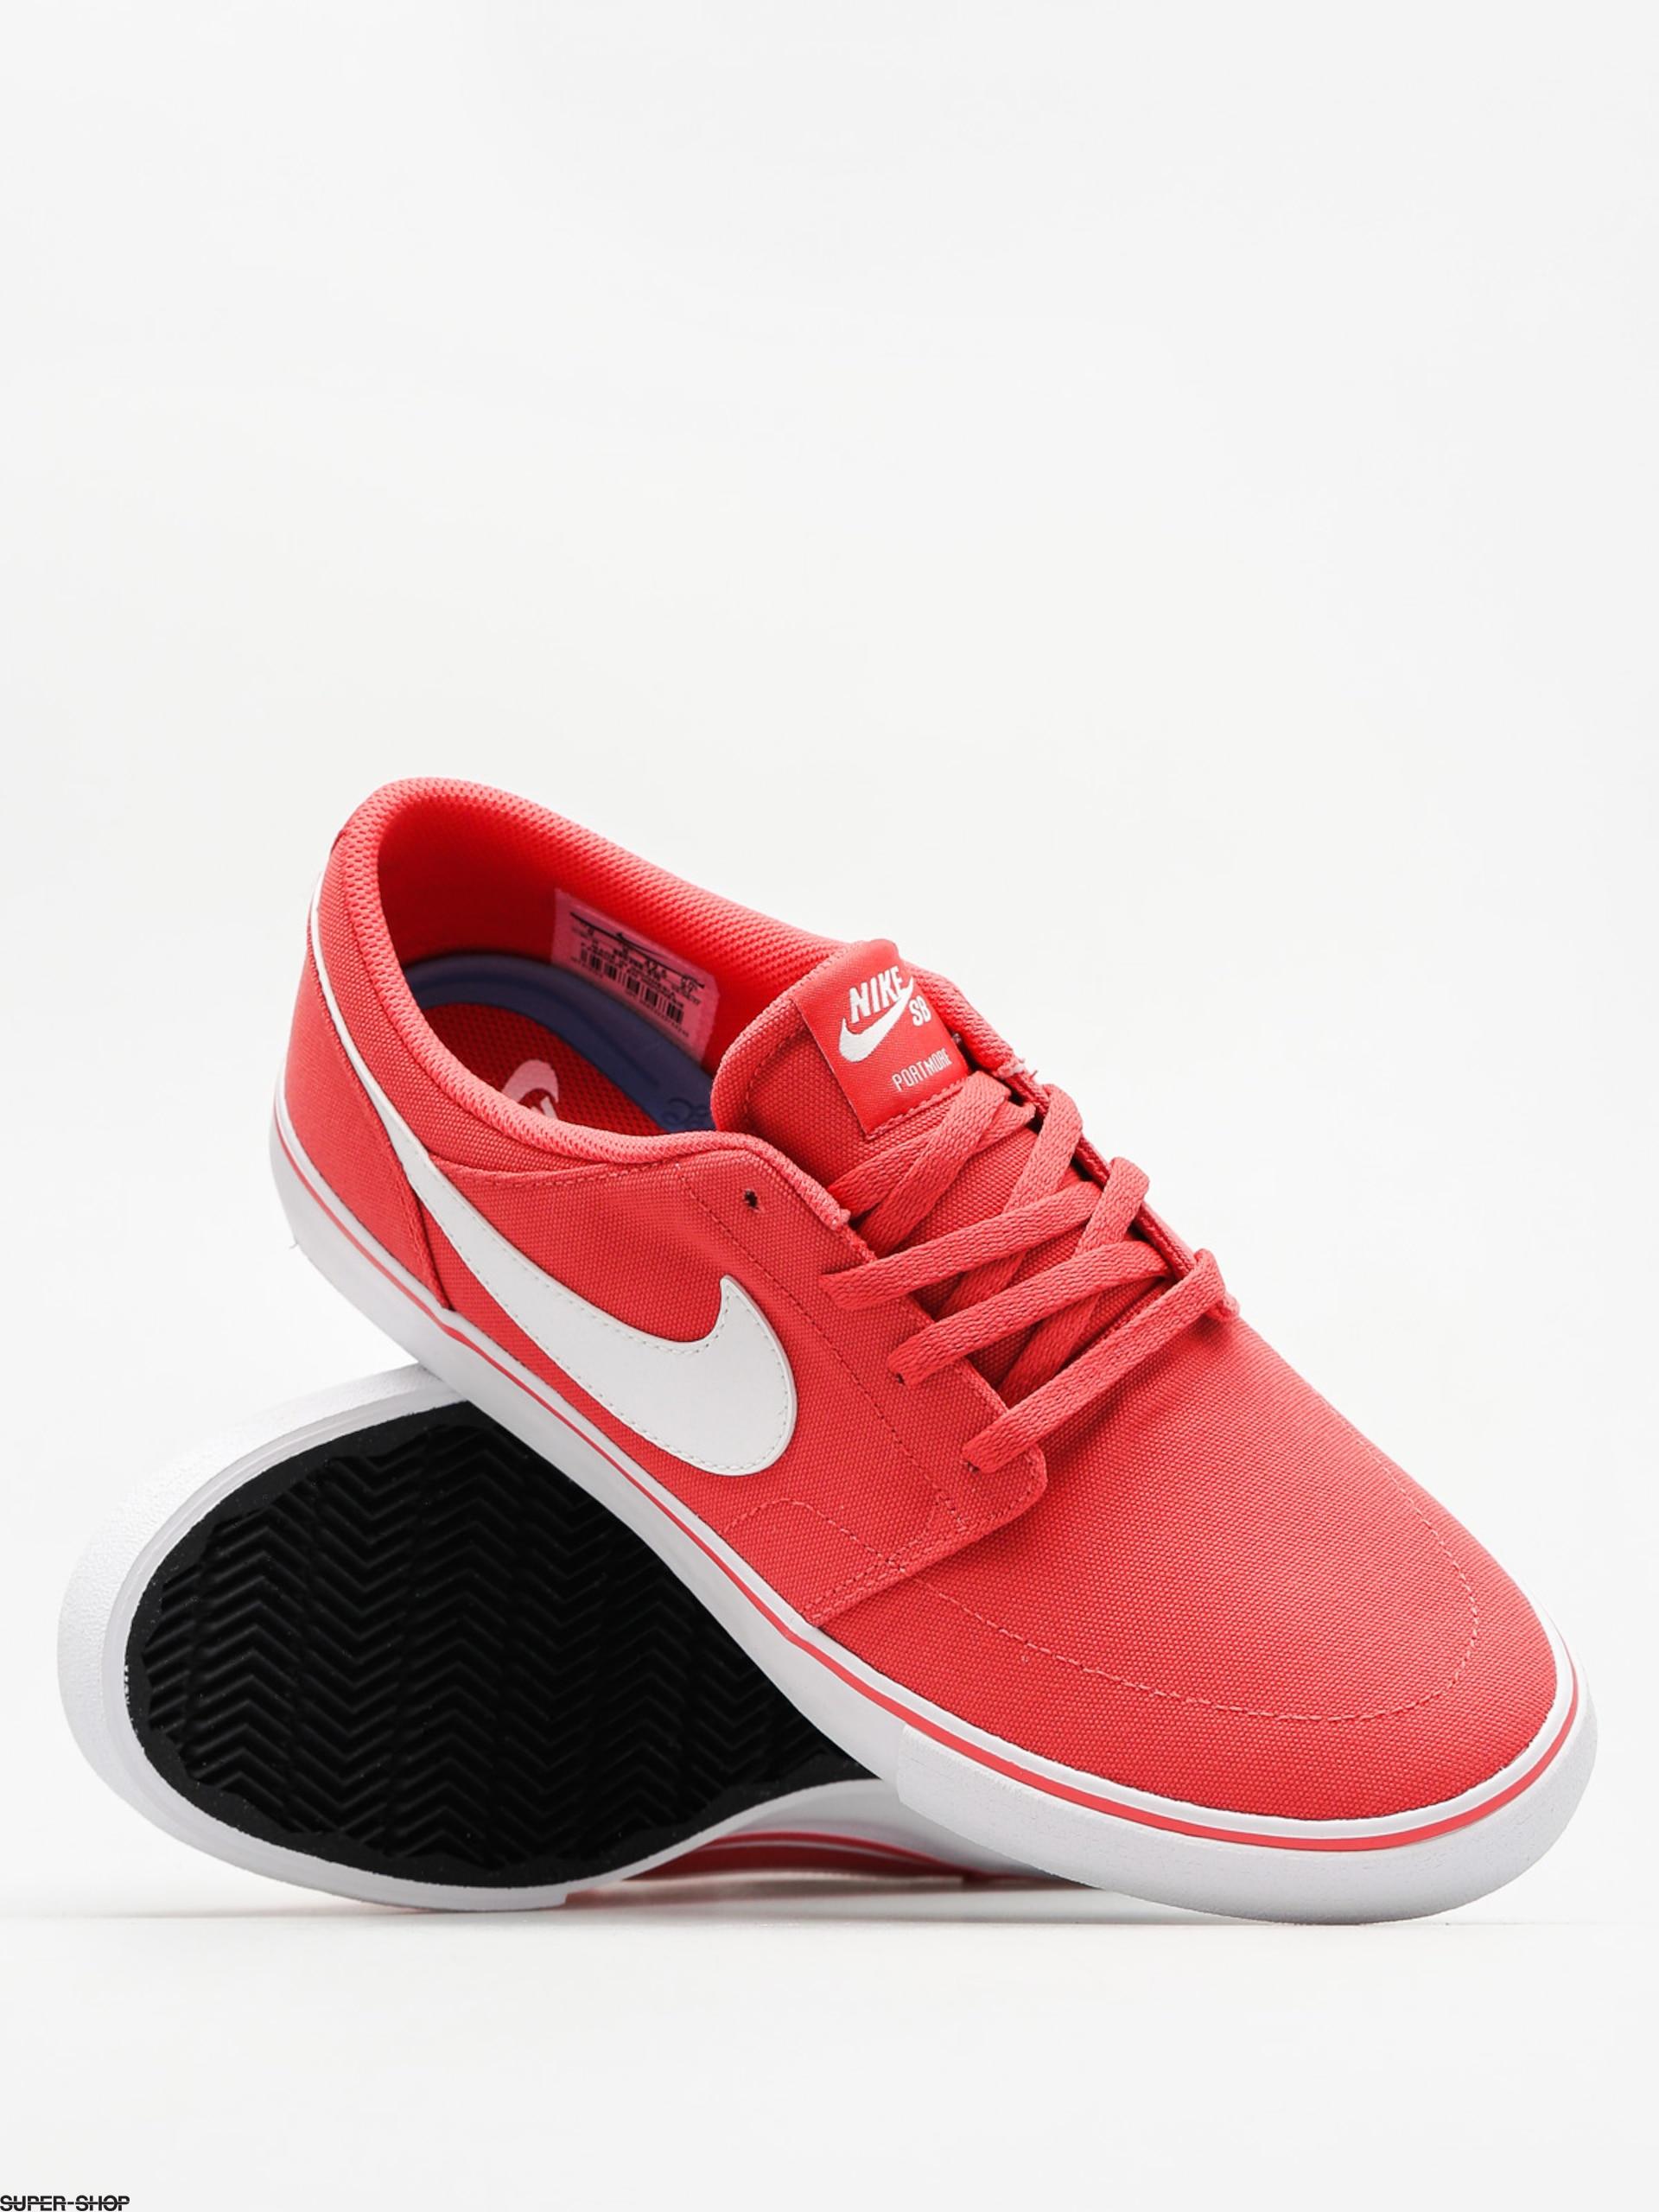 Nike SB Schuhe Nike Sb Portmore II Solar Cnvs (track rot Weiß schwarz) Einfach zu bedienen